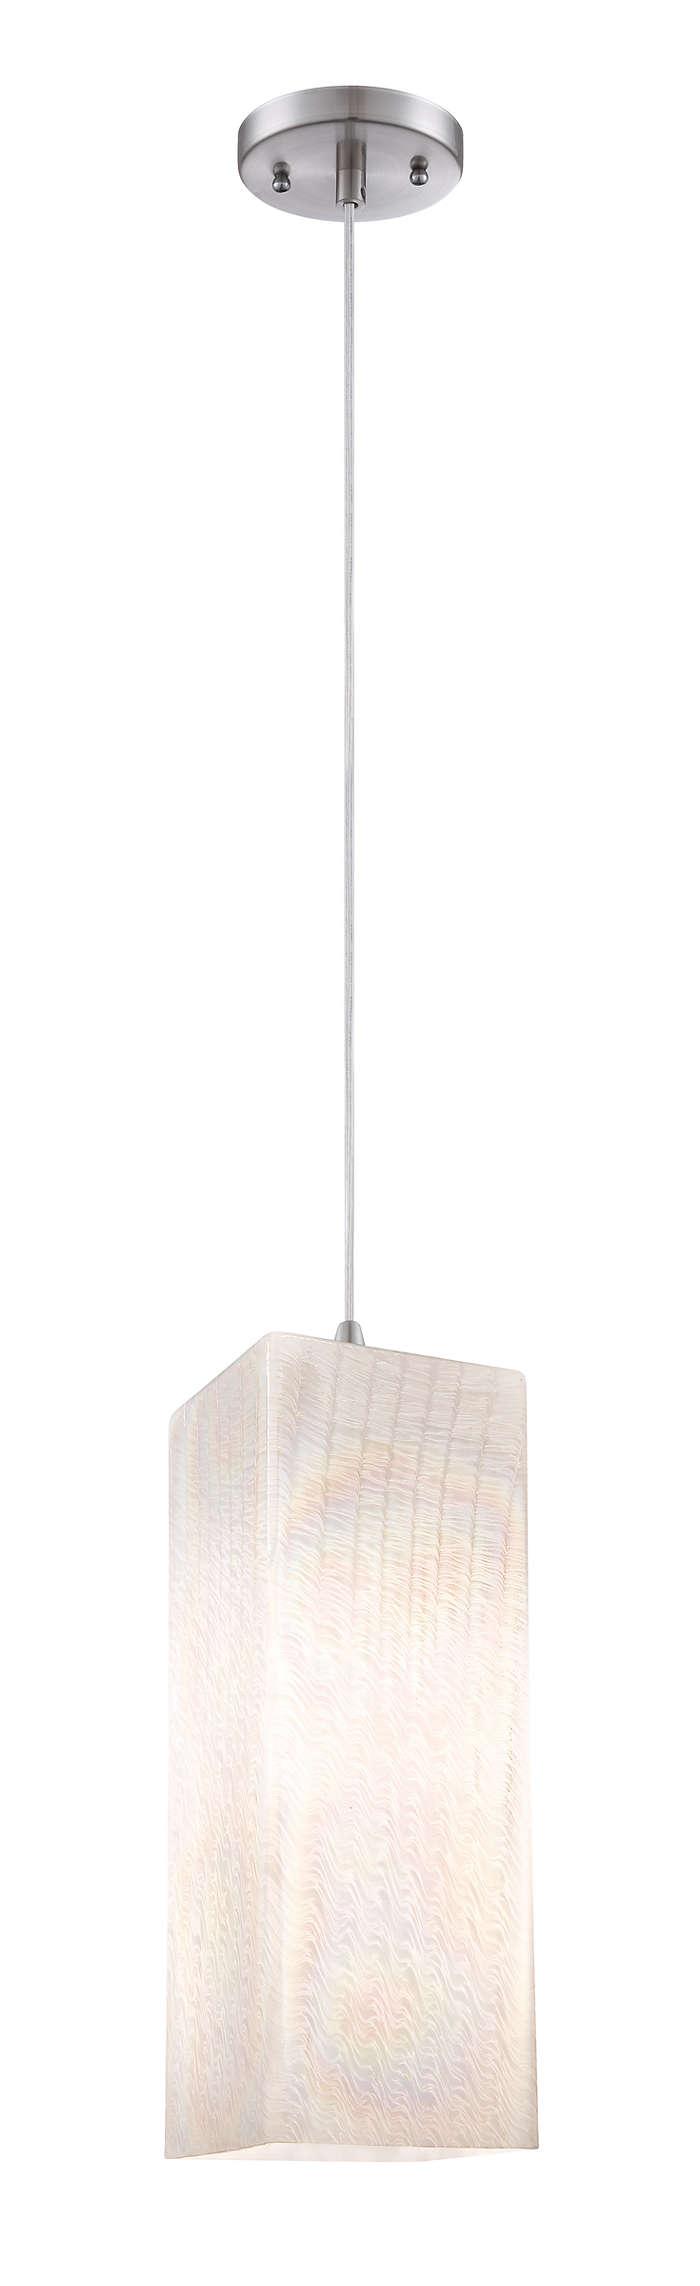 Cotton Candy 1-light pendant, Satin Nickel finish